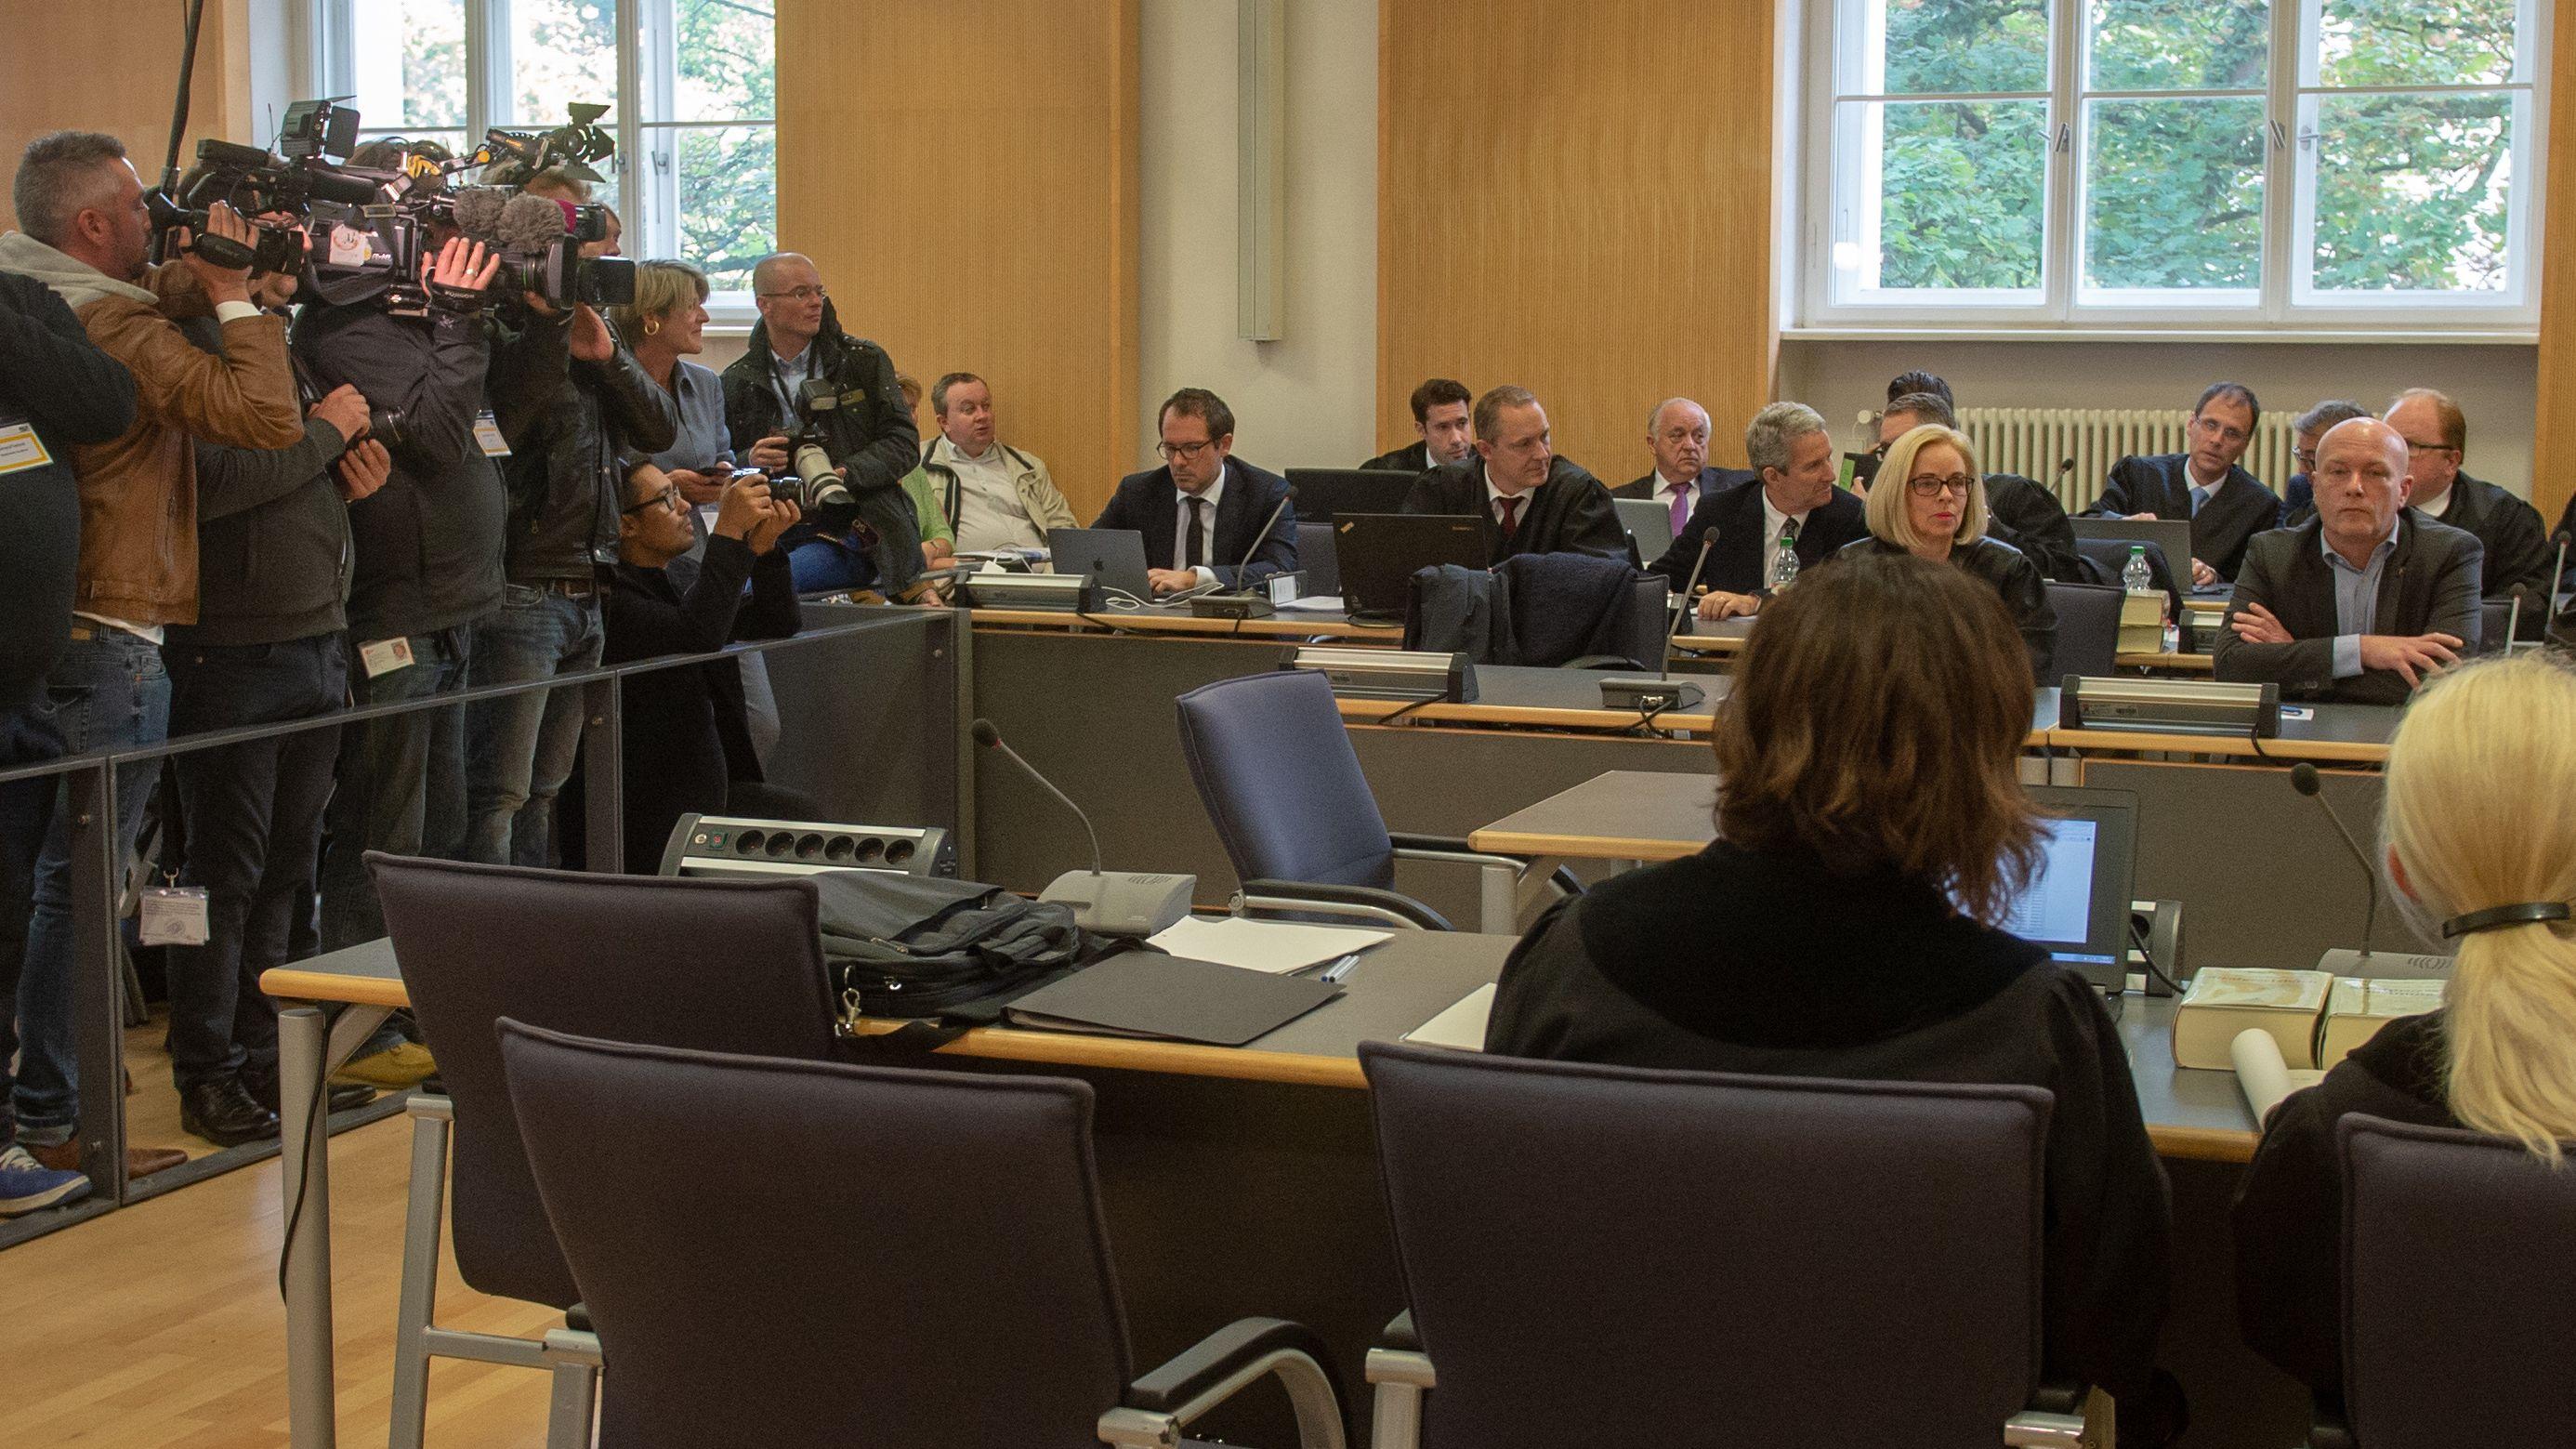 Kamerateams filmen Joachim Wolbergs im Gerichtssaal des Landgerichts Regensburg